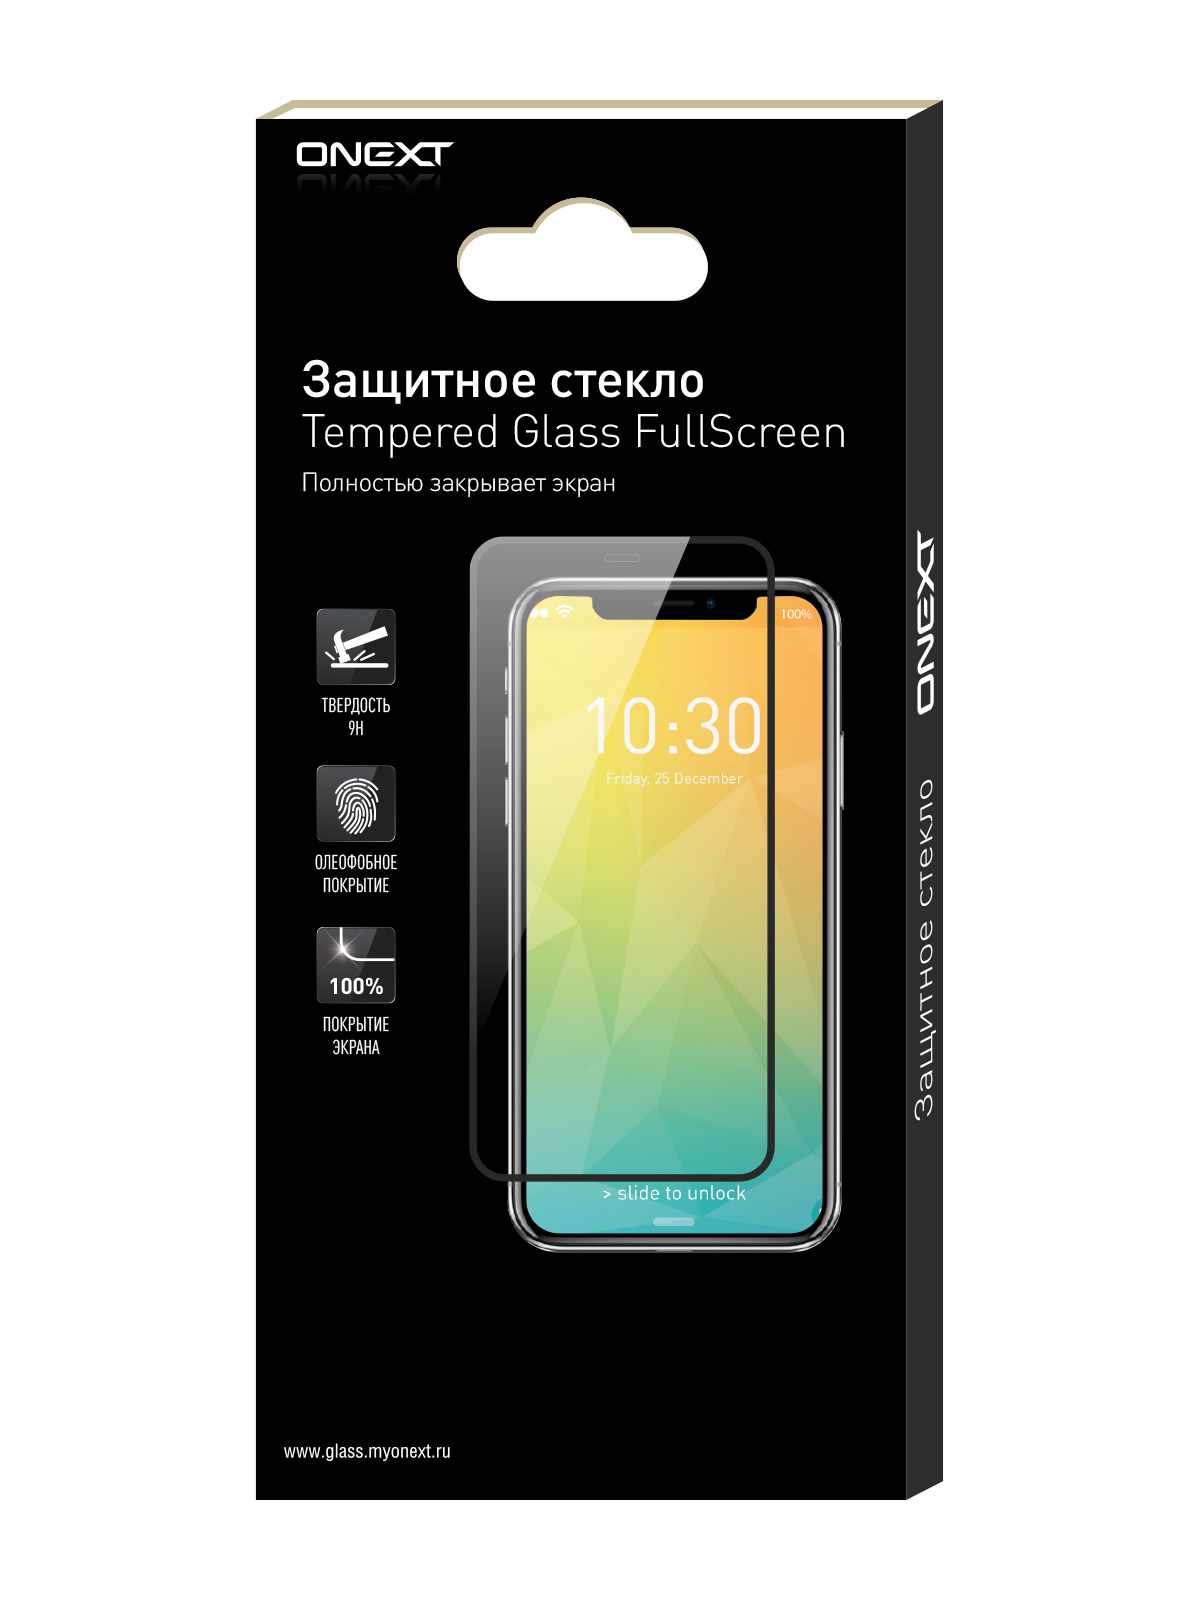 Защитное стекло ONEXT для Asus ZenFone 5Z (ZS620KL) Black